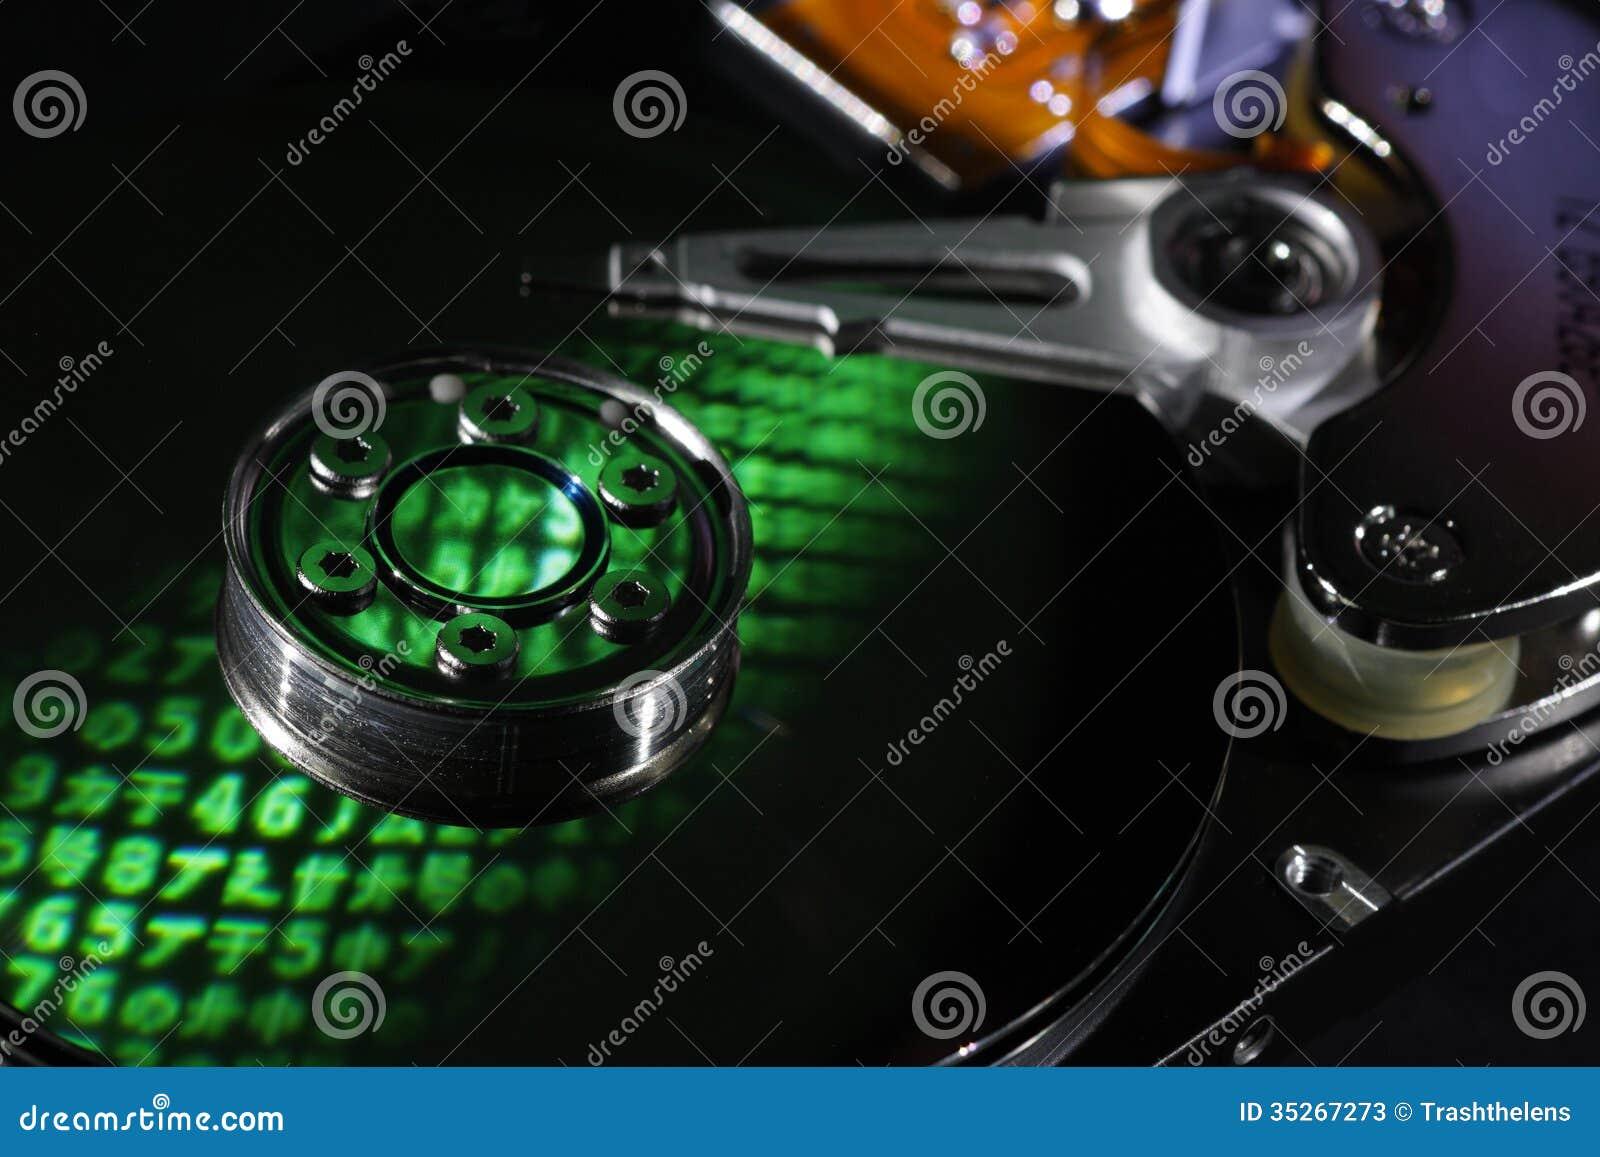 Encrypted Hard Drive Stock Photos Image 35267273